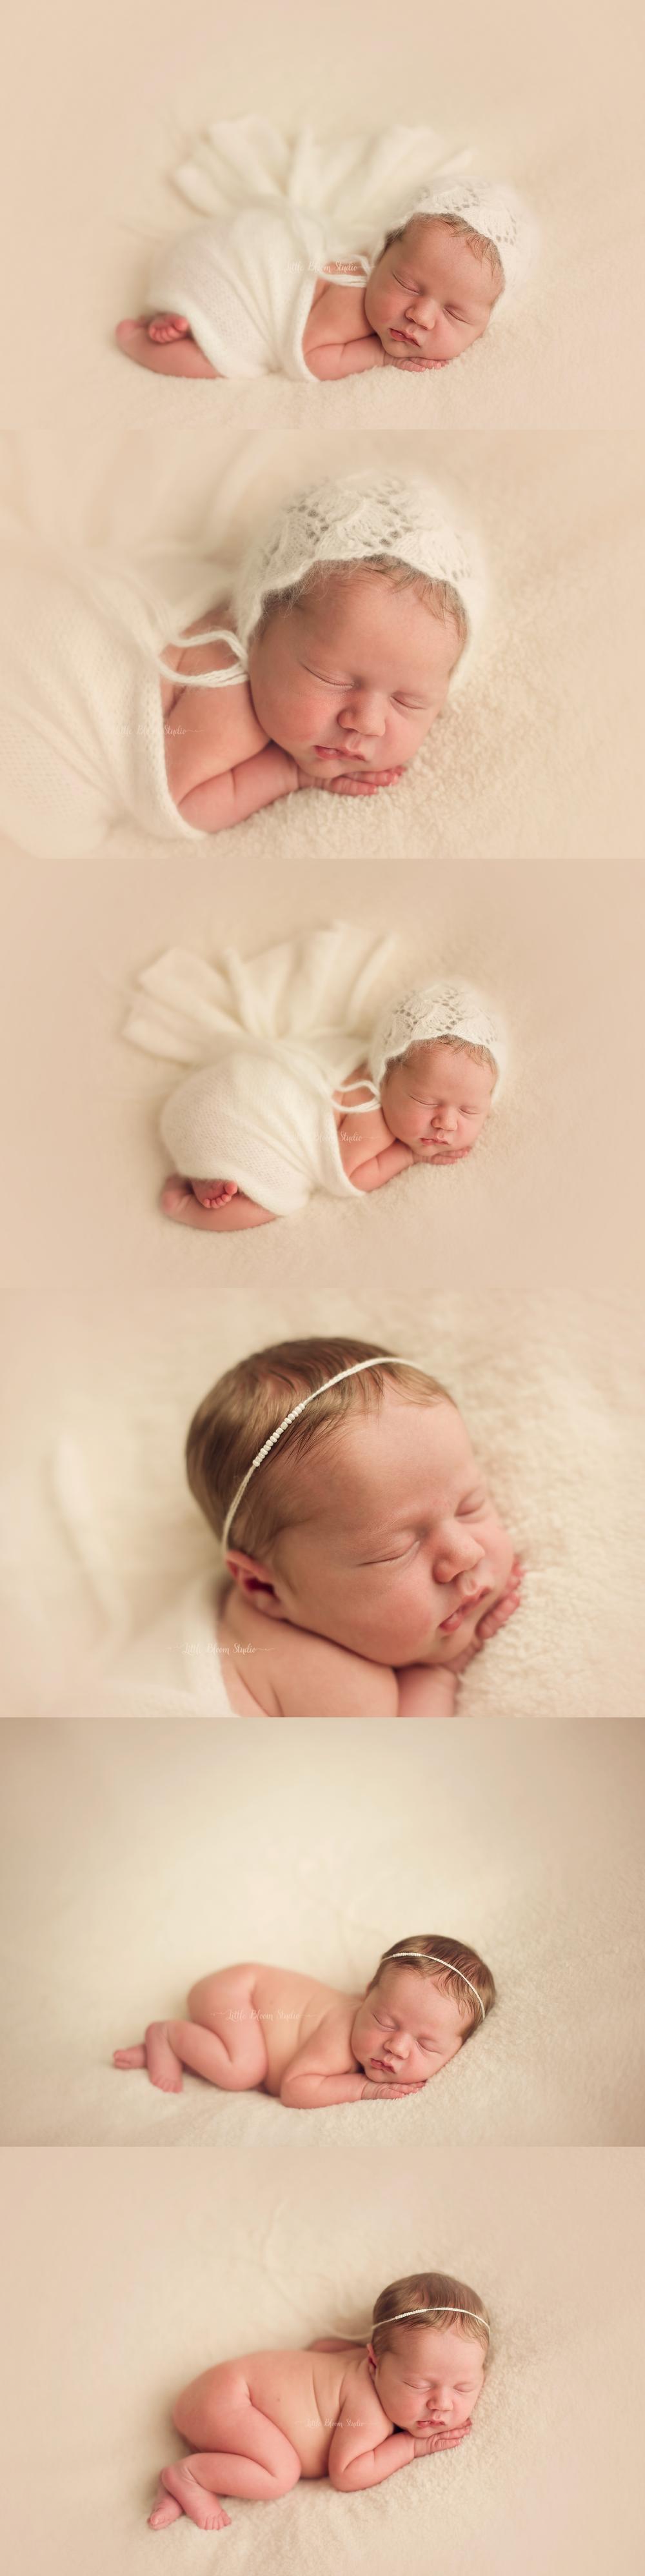 greenville baby photographer.jpg